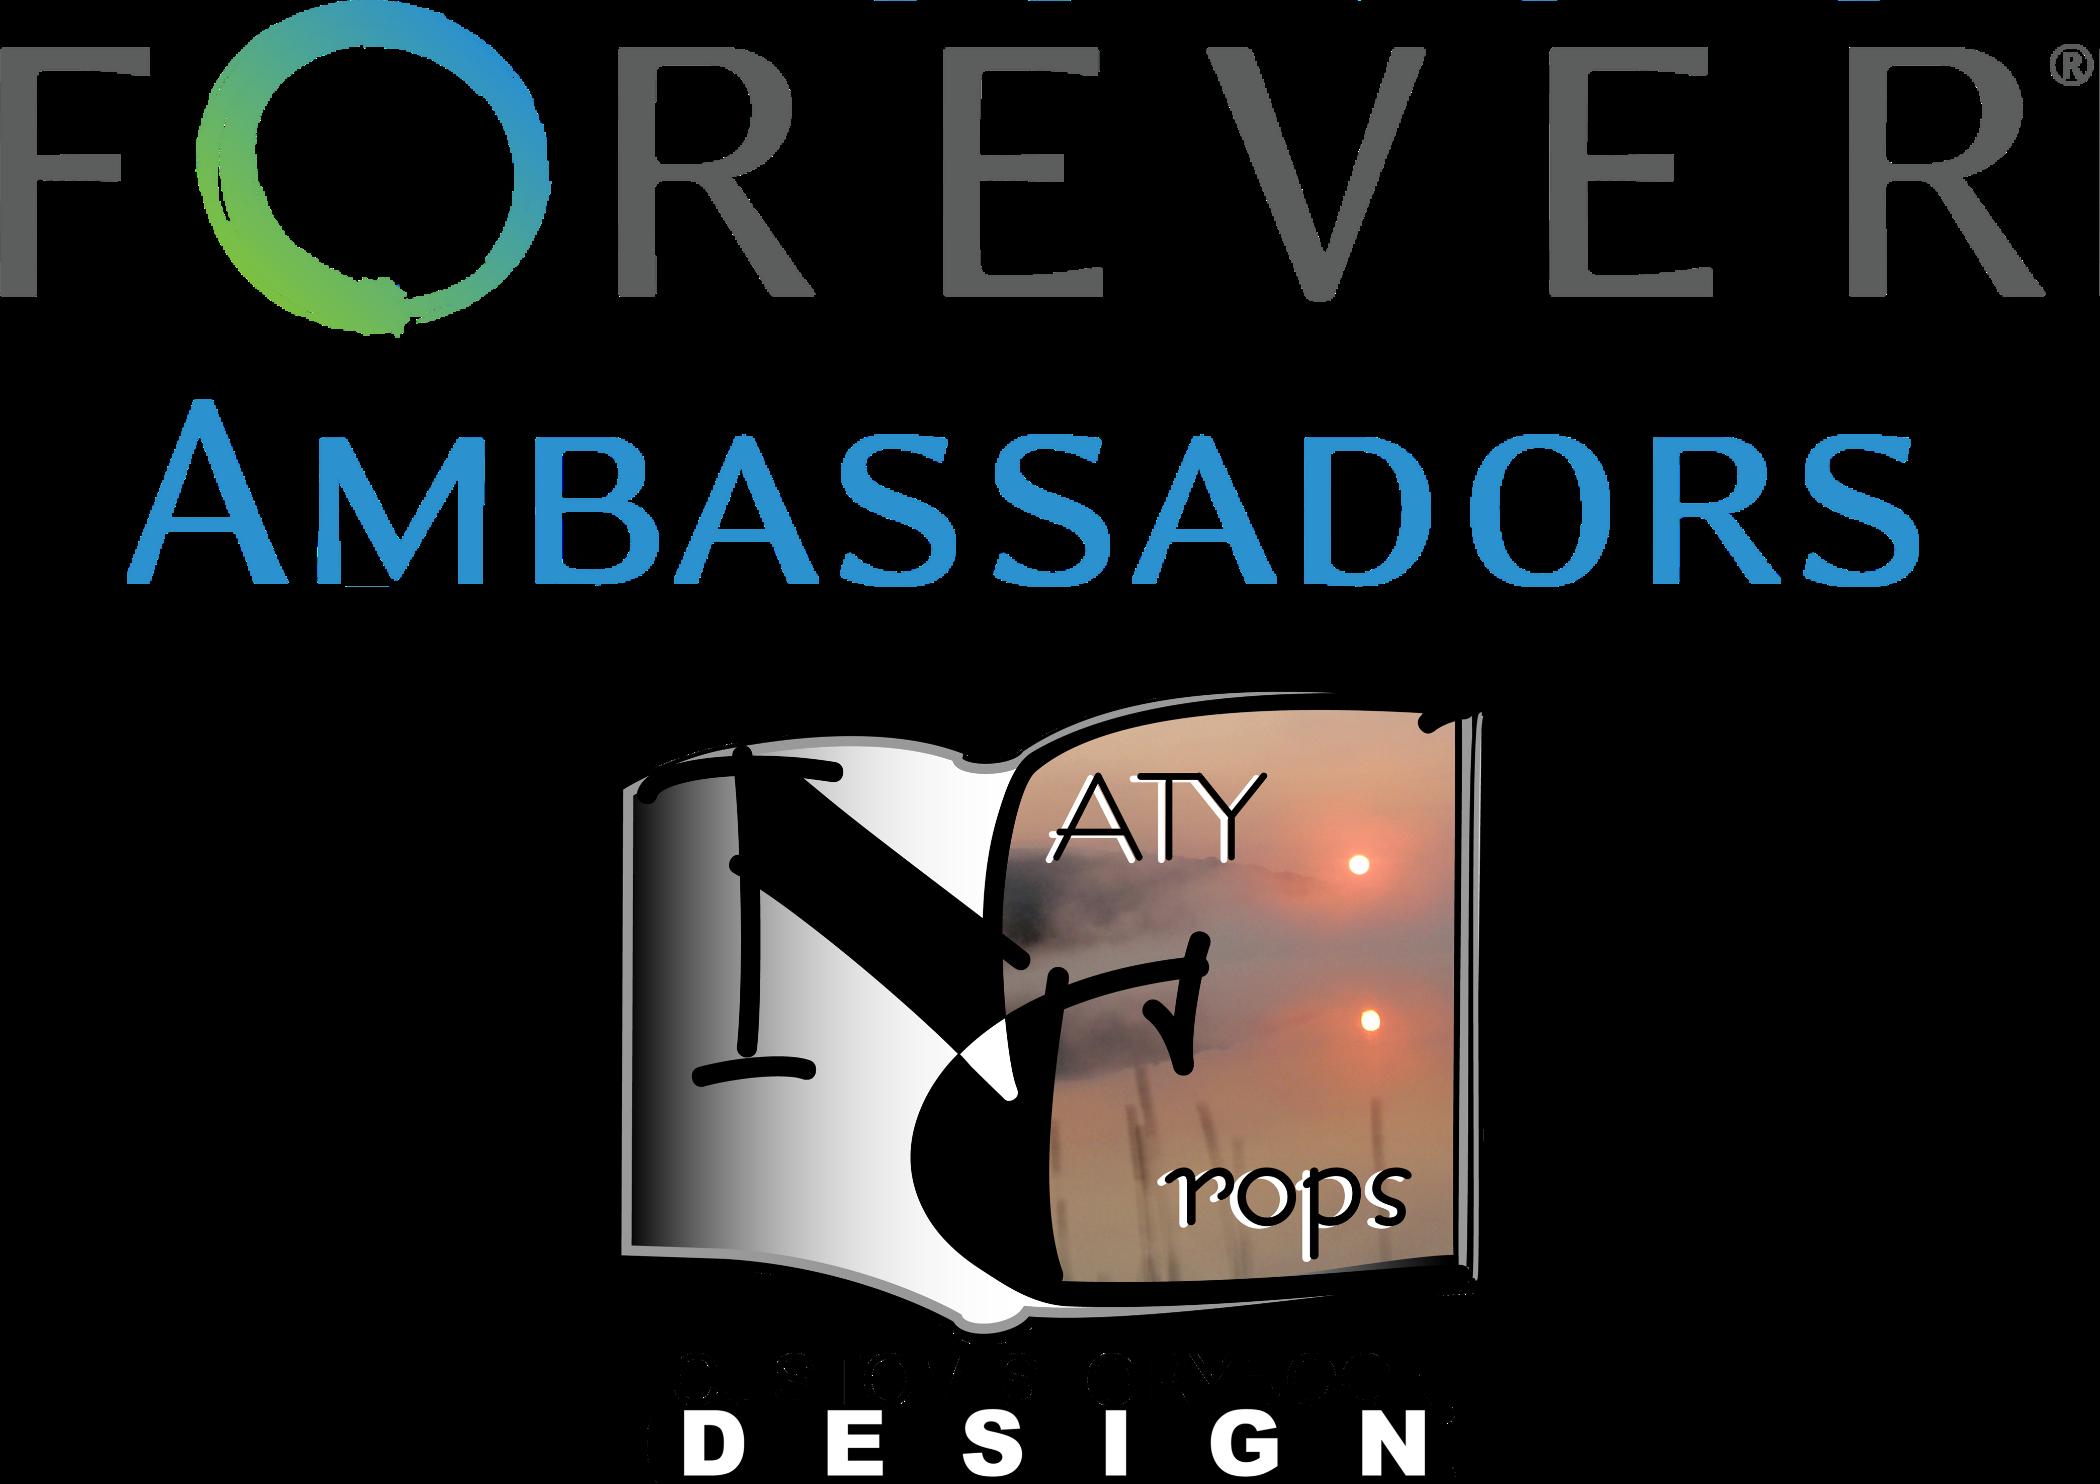 Sponsor NatyCrops Custom Storybook Design